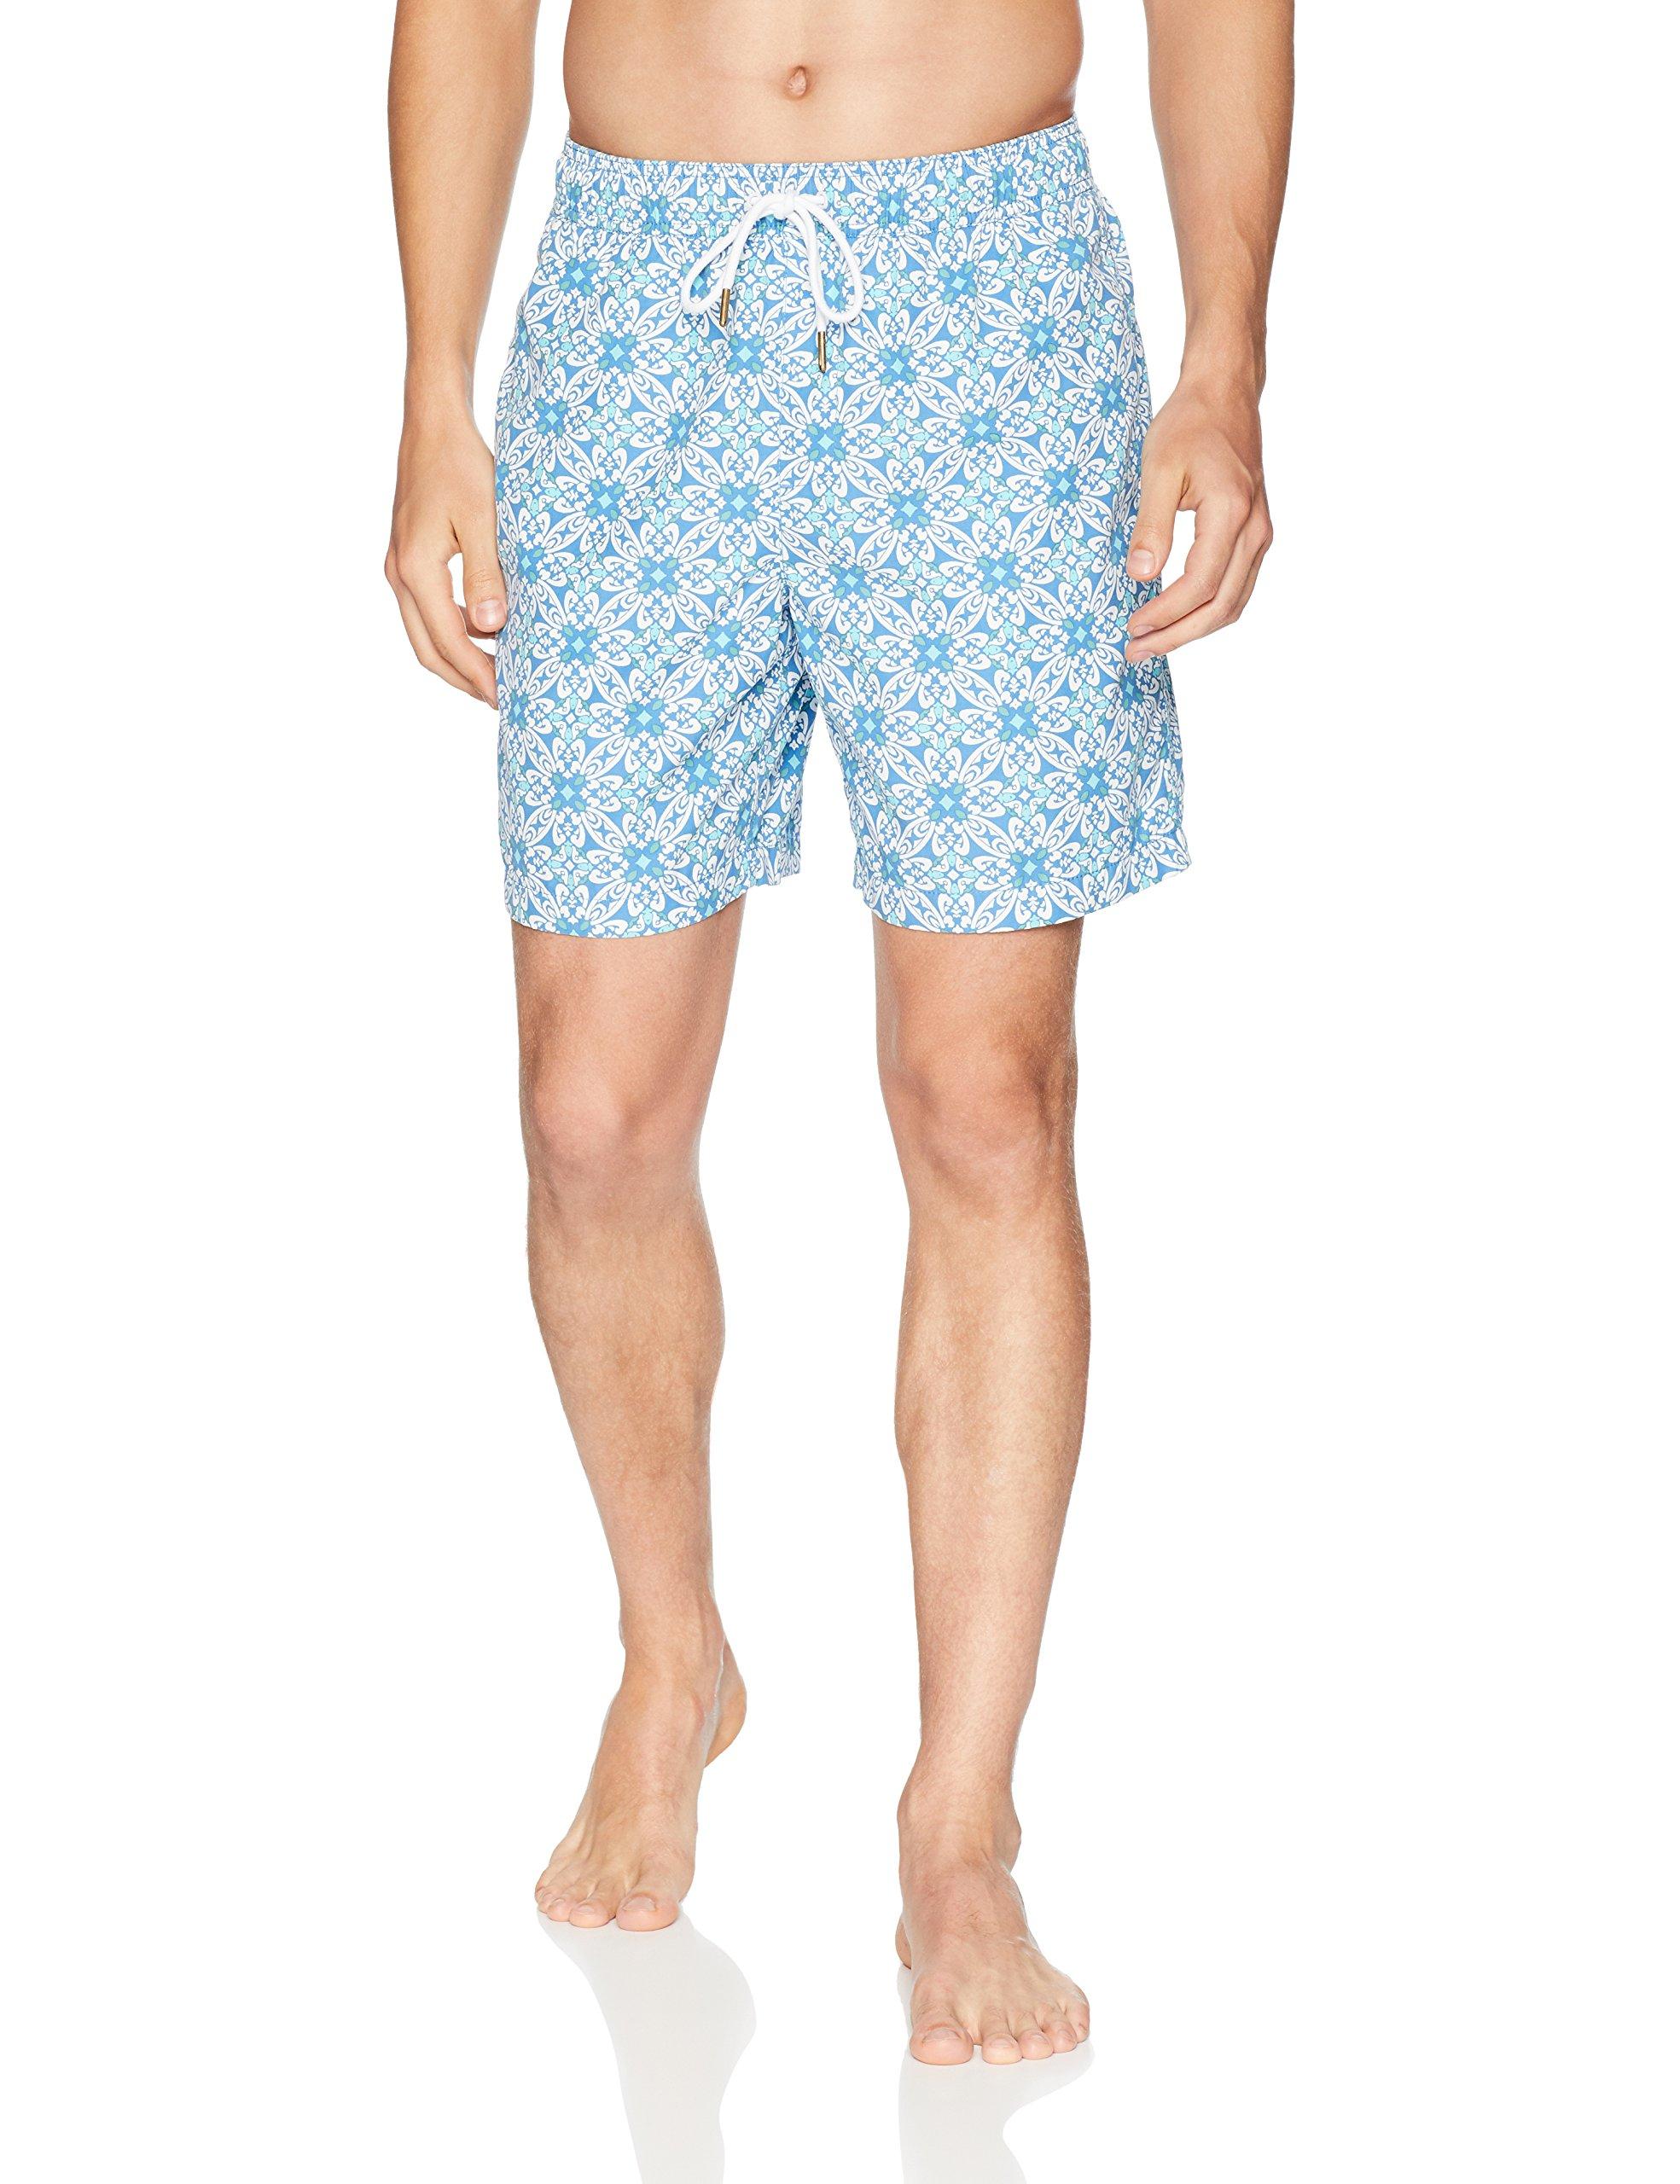 Goodthreads Men's 7'' Inseam Swim Trunk, Blue Tile, Large